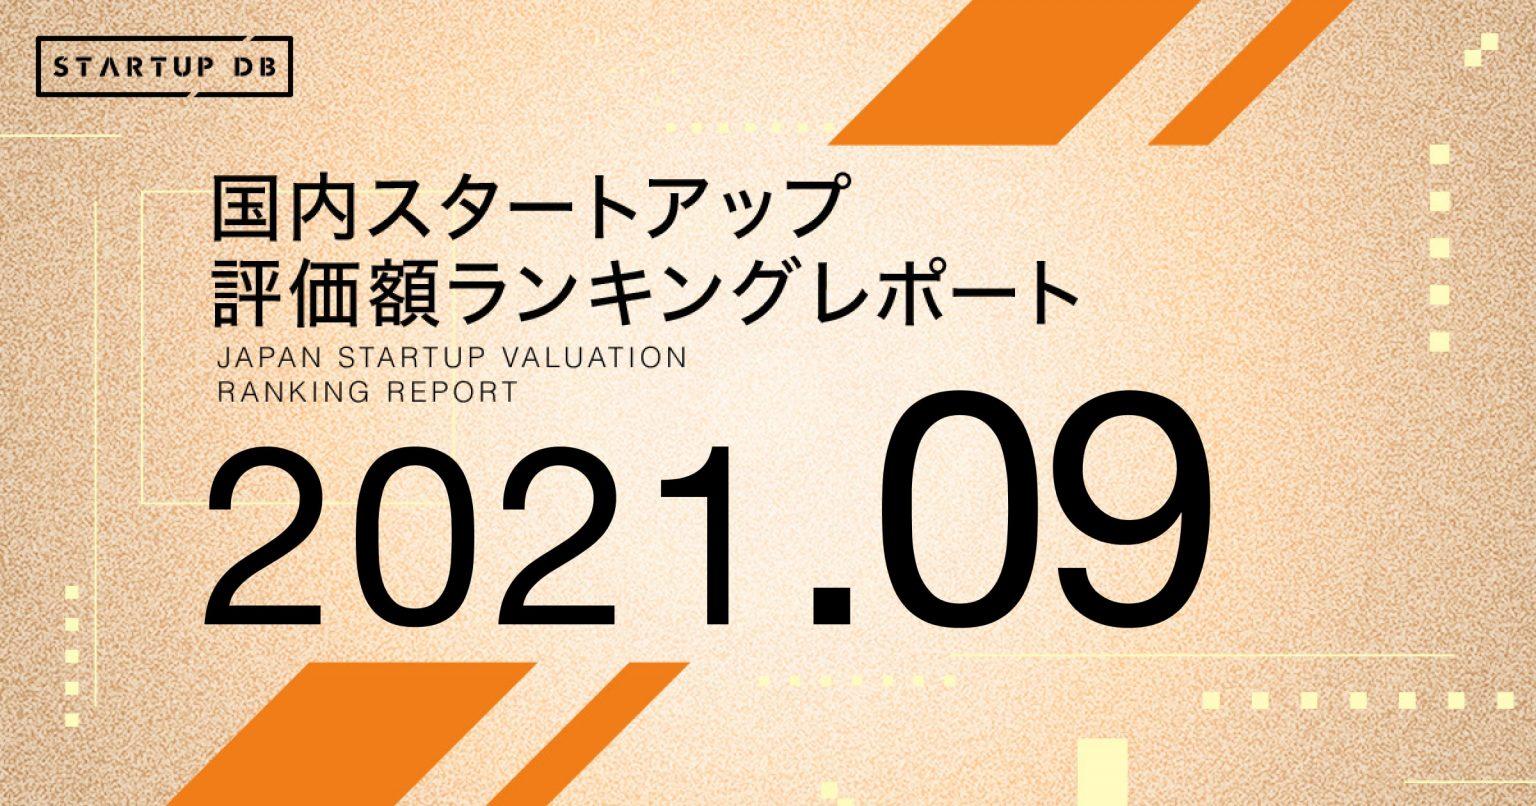 【STARTUP DB】調査結果 国内スタートアップ評価額ランキング(2021年9月)